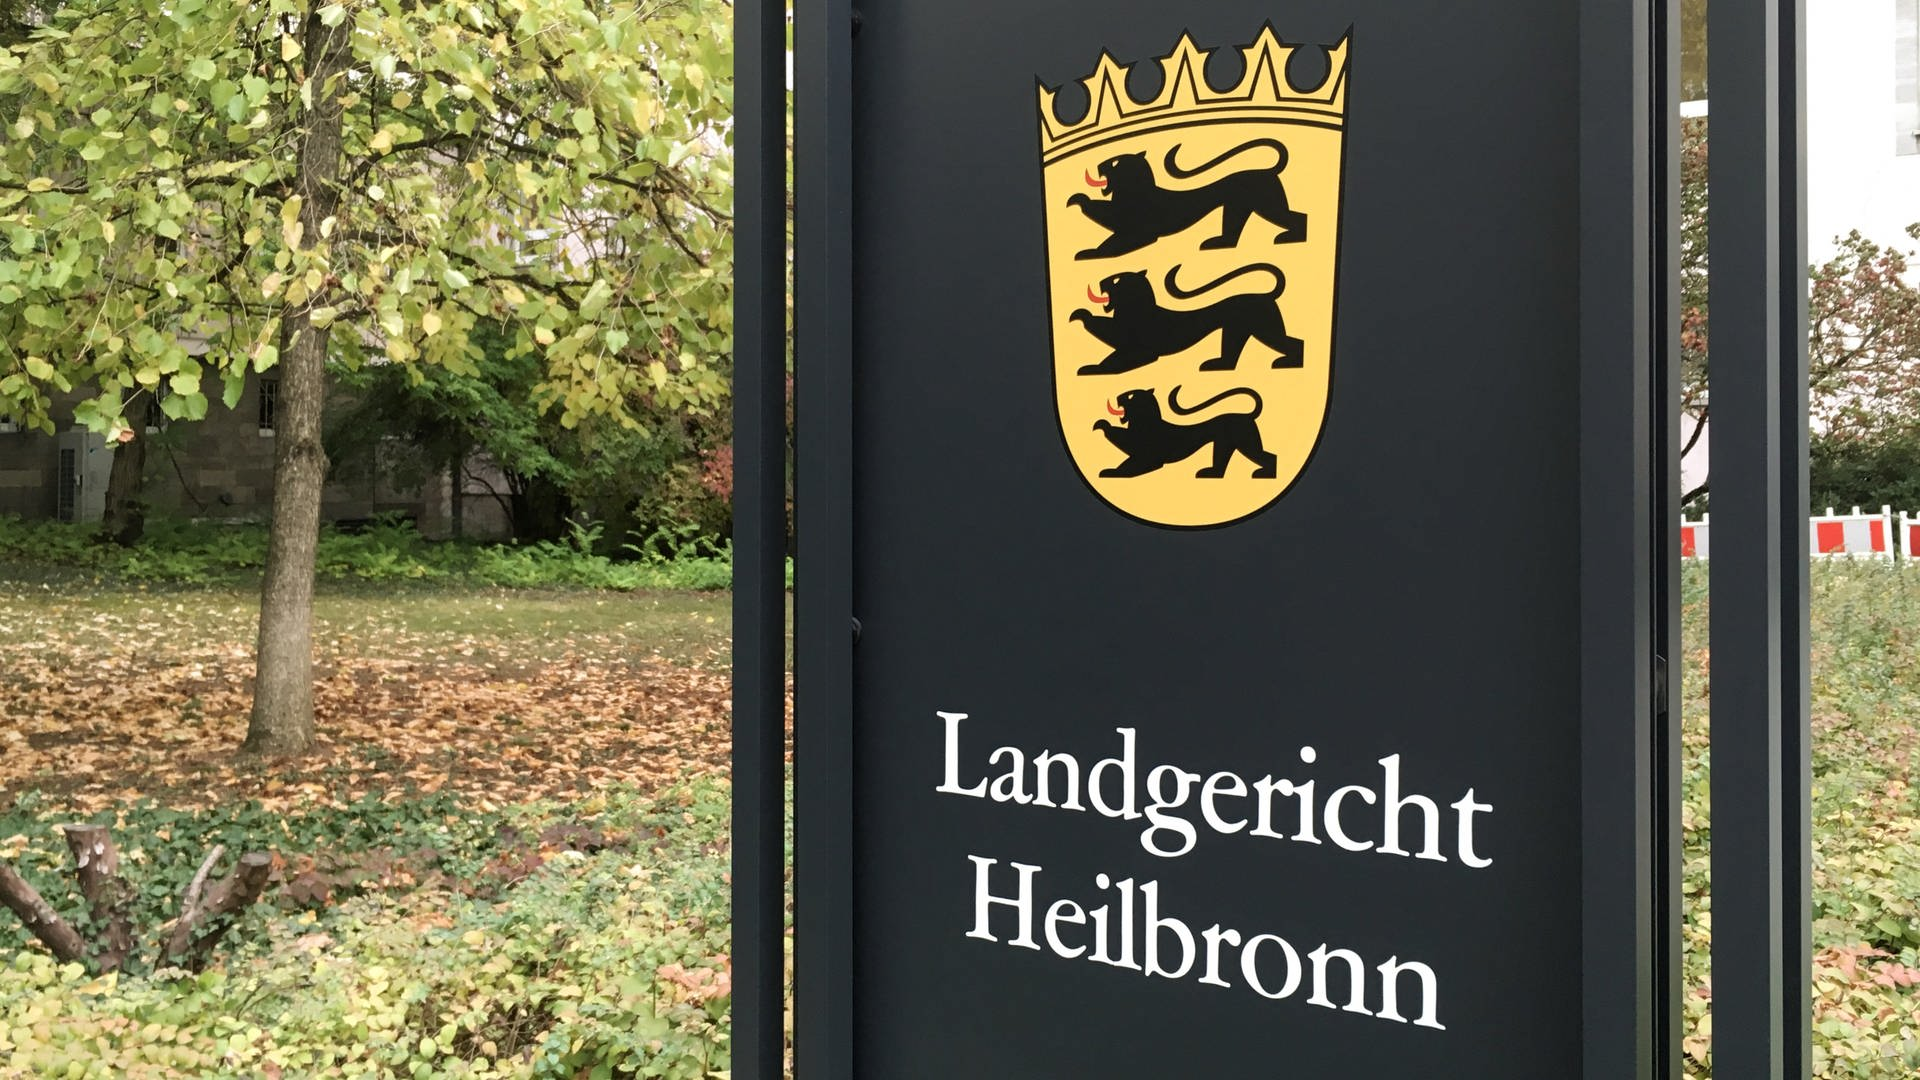 Das Heilbronner Landgericht